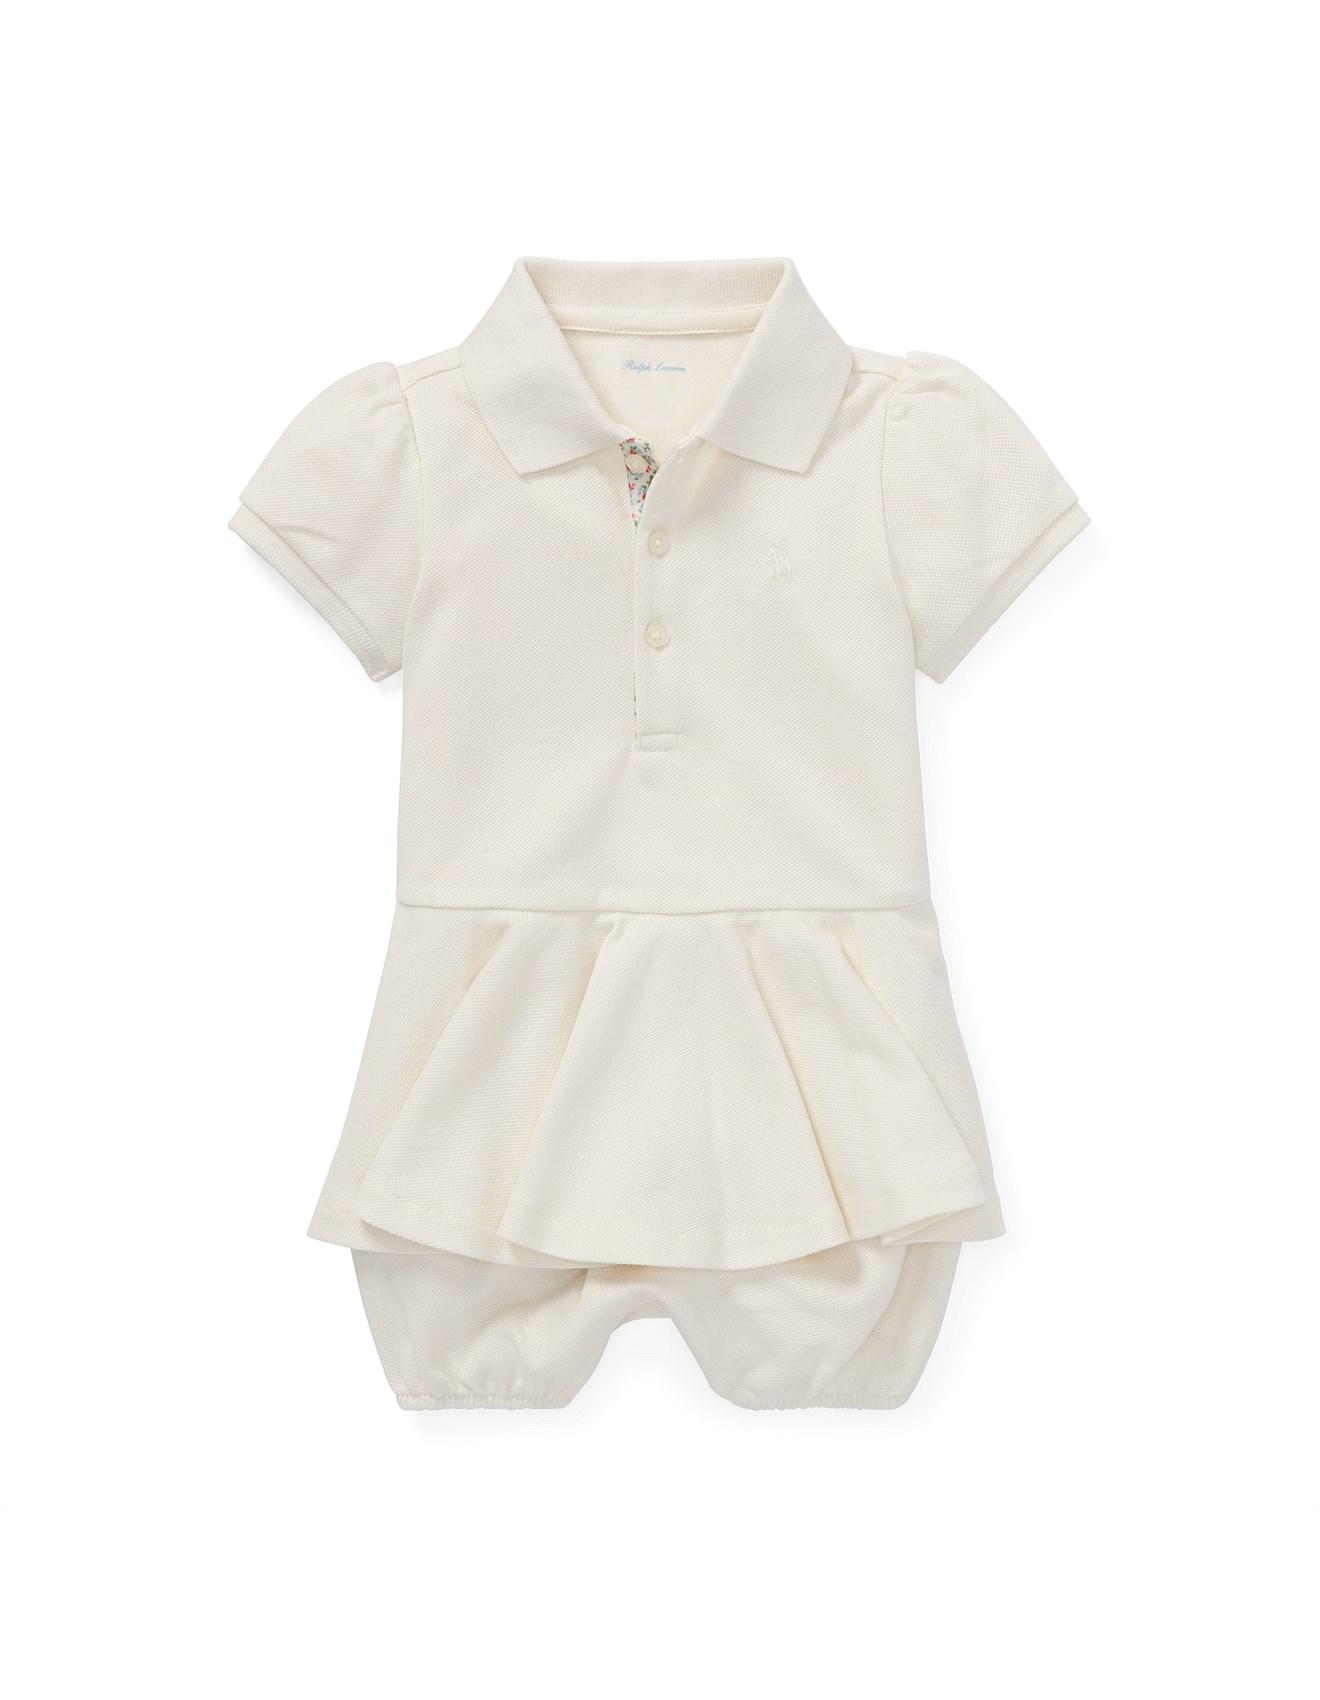 cc361ad5fe79 Baby Girl Clothing Sale